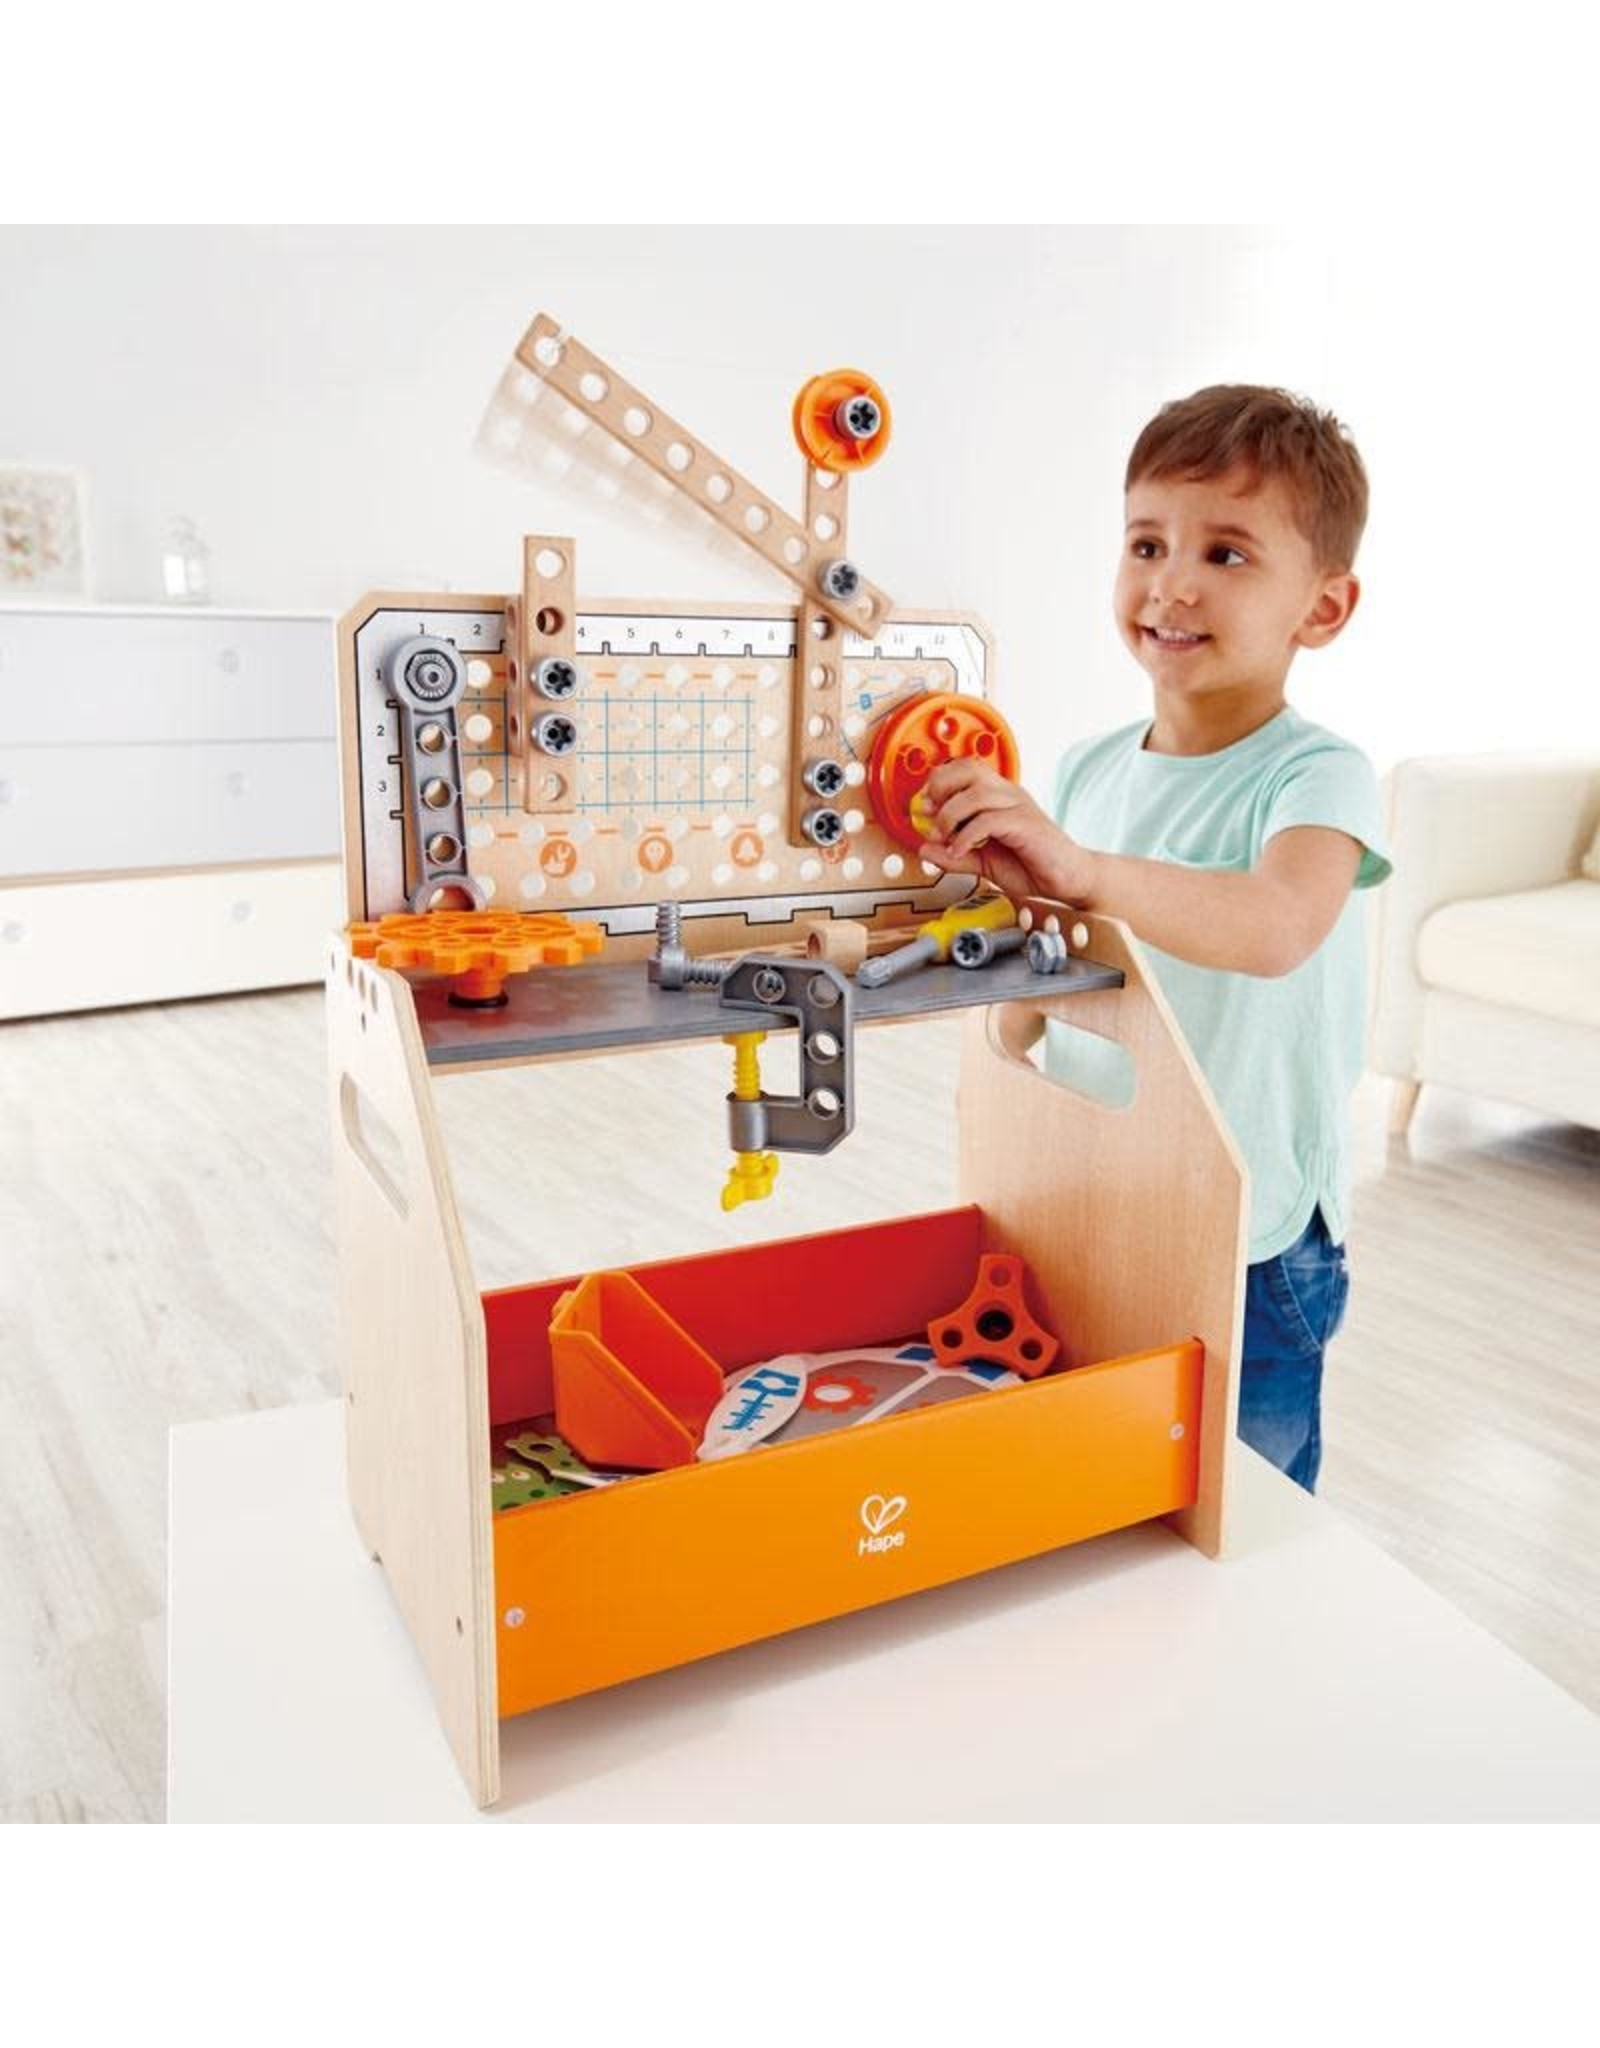 Hape Junior Inventor Discovery Scientific Workbench